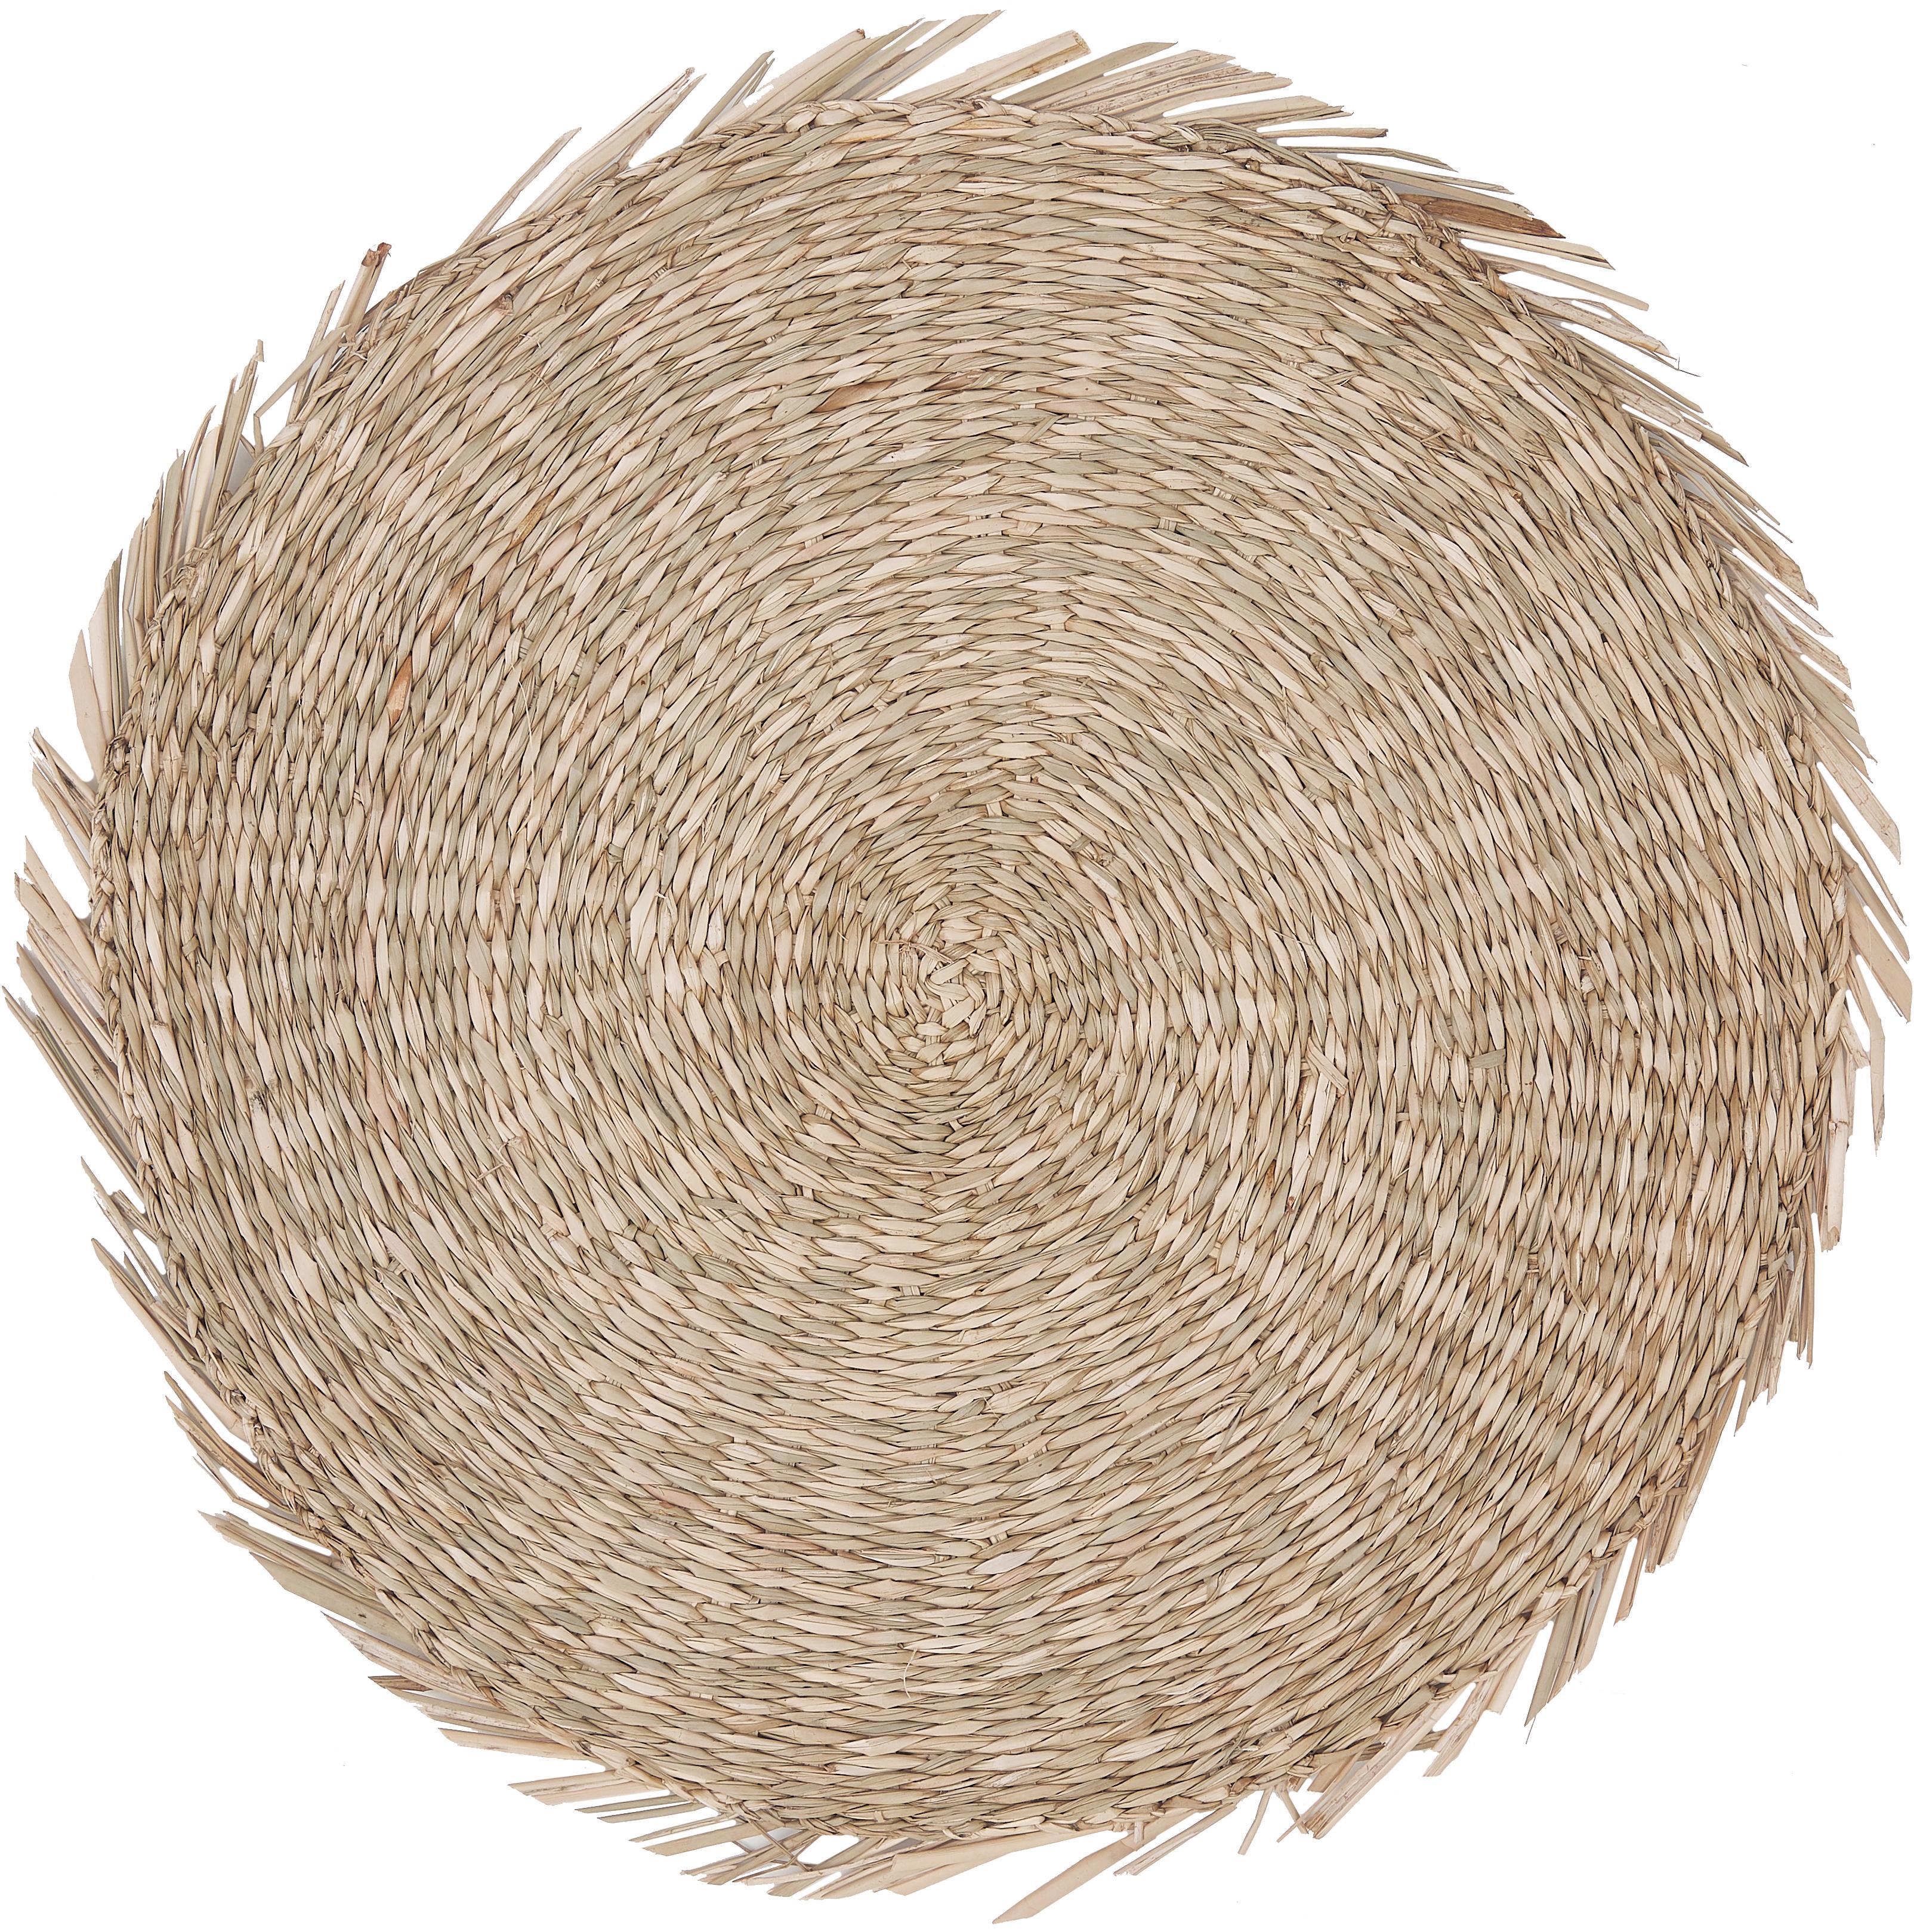 Mantel individual redondo de seagrass Whirl, Seagrass, Beige, Ø 38 cm